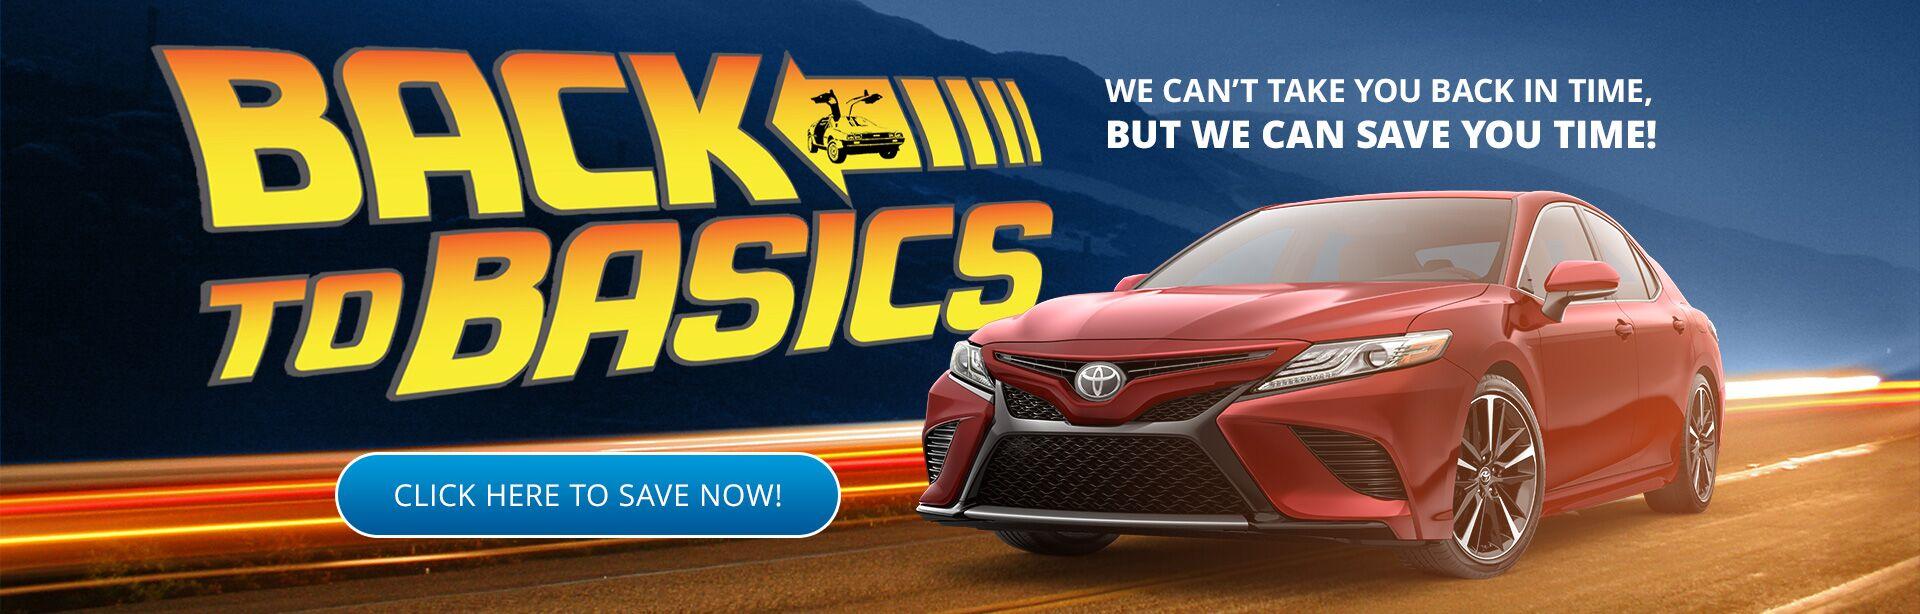 Car Dealerships In Jacksonville Fl >> Used Car Dealership Jacksonville Fl Autobasics